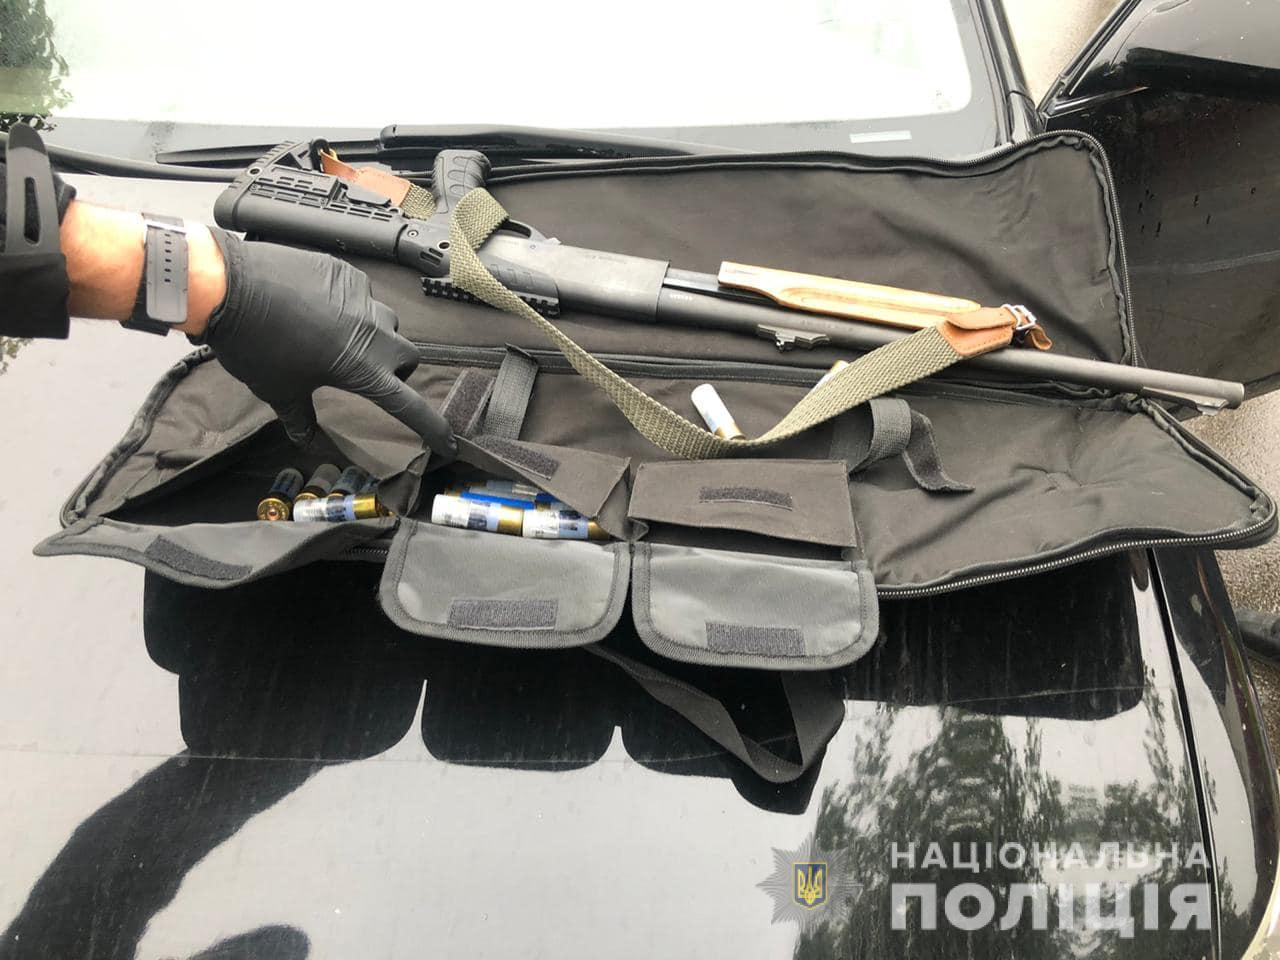 Война за маршрут на Киев. Перестрелка 100 титушек в Броварах: все подробности